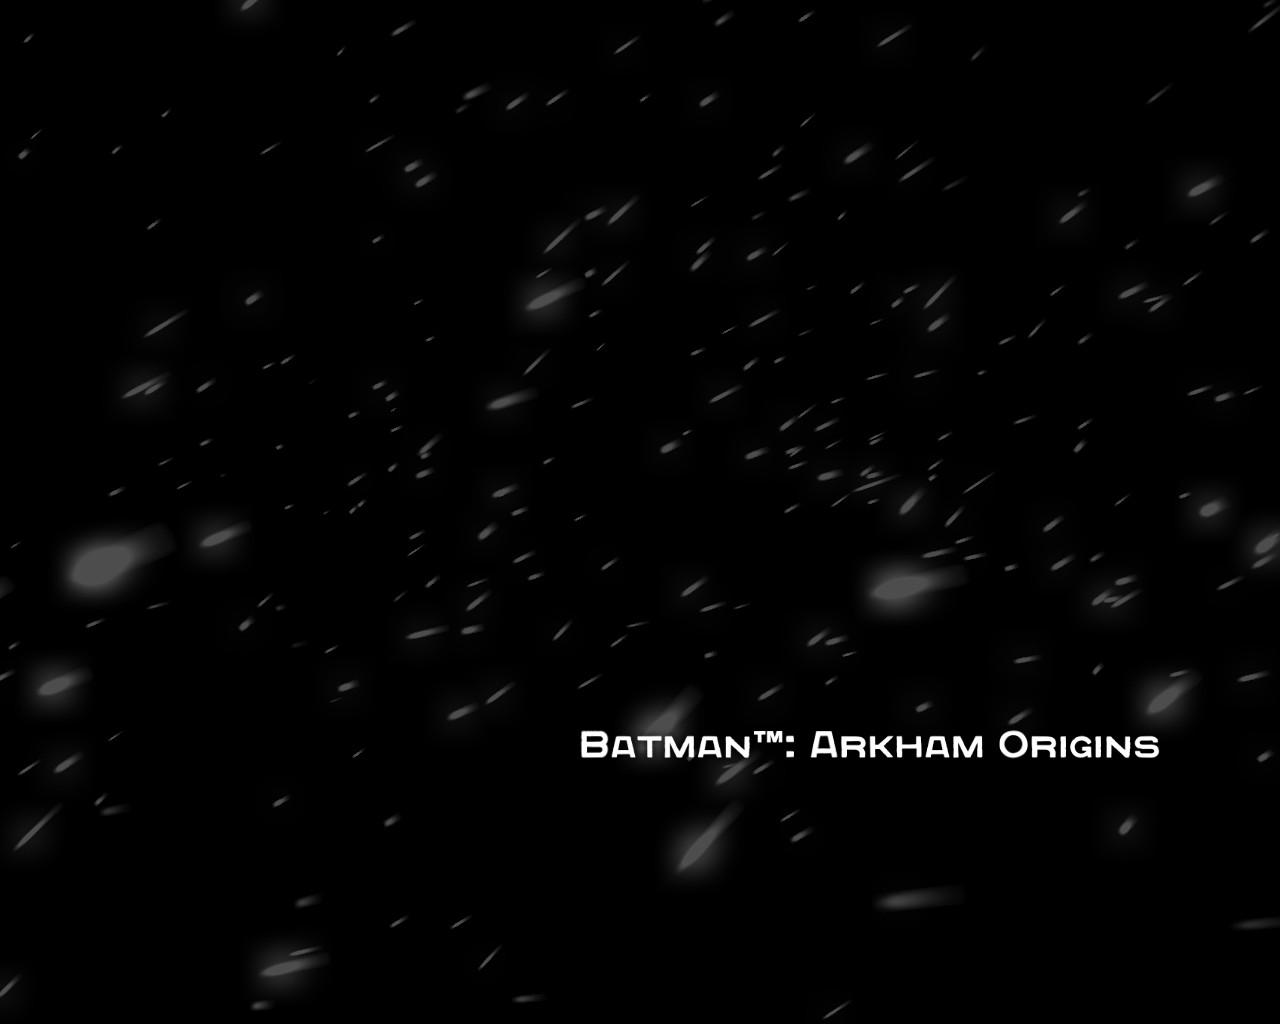 BatmanOrigins 2014-07-06 02-39-30-51.jpg - Batman: Arkham Origins